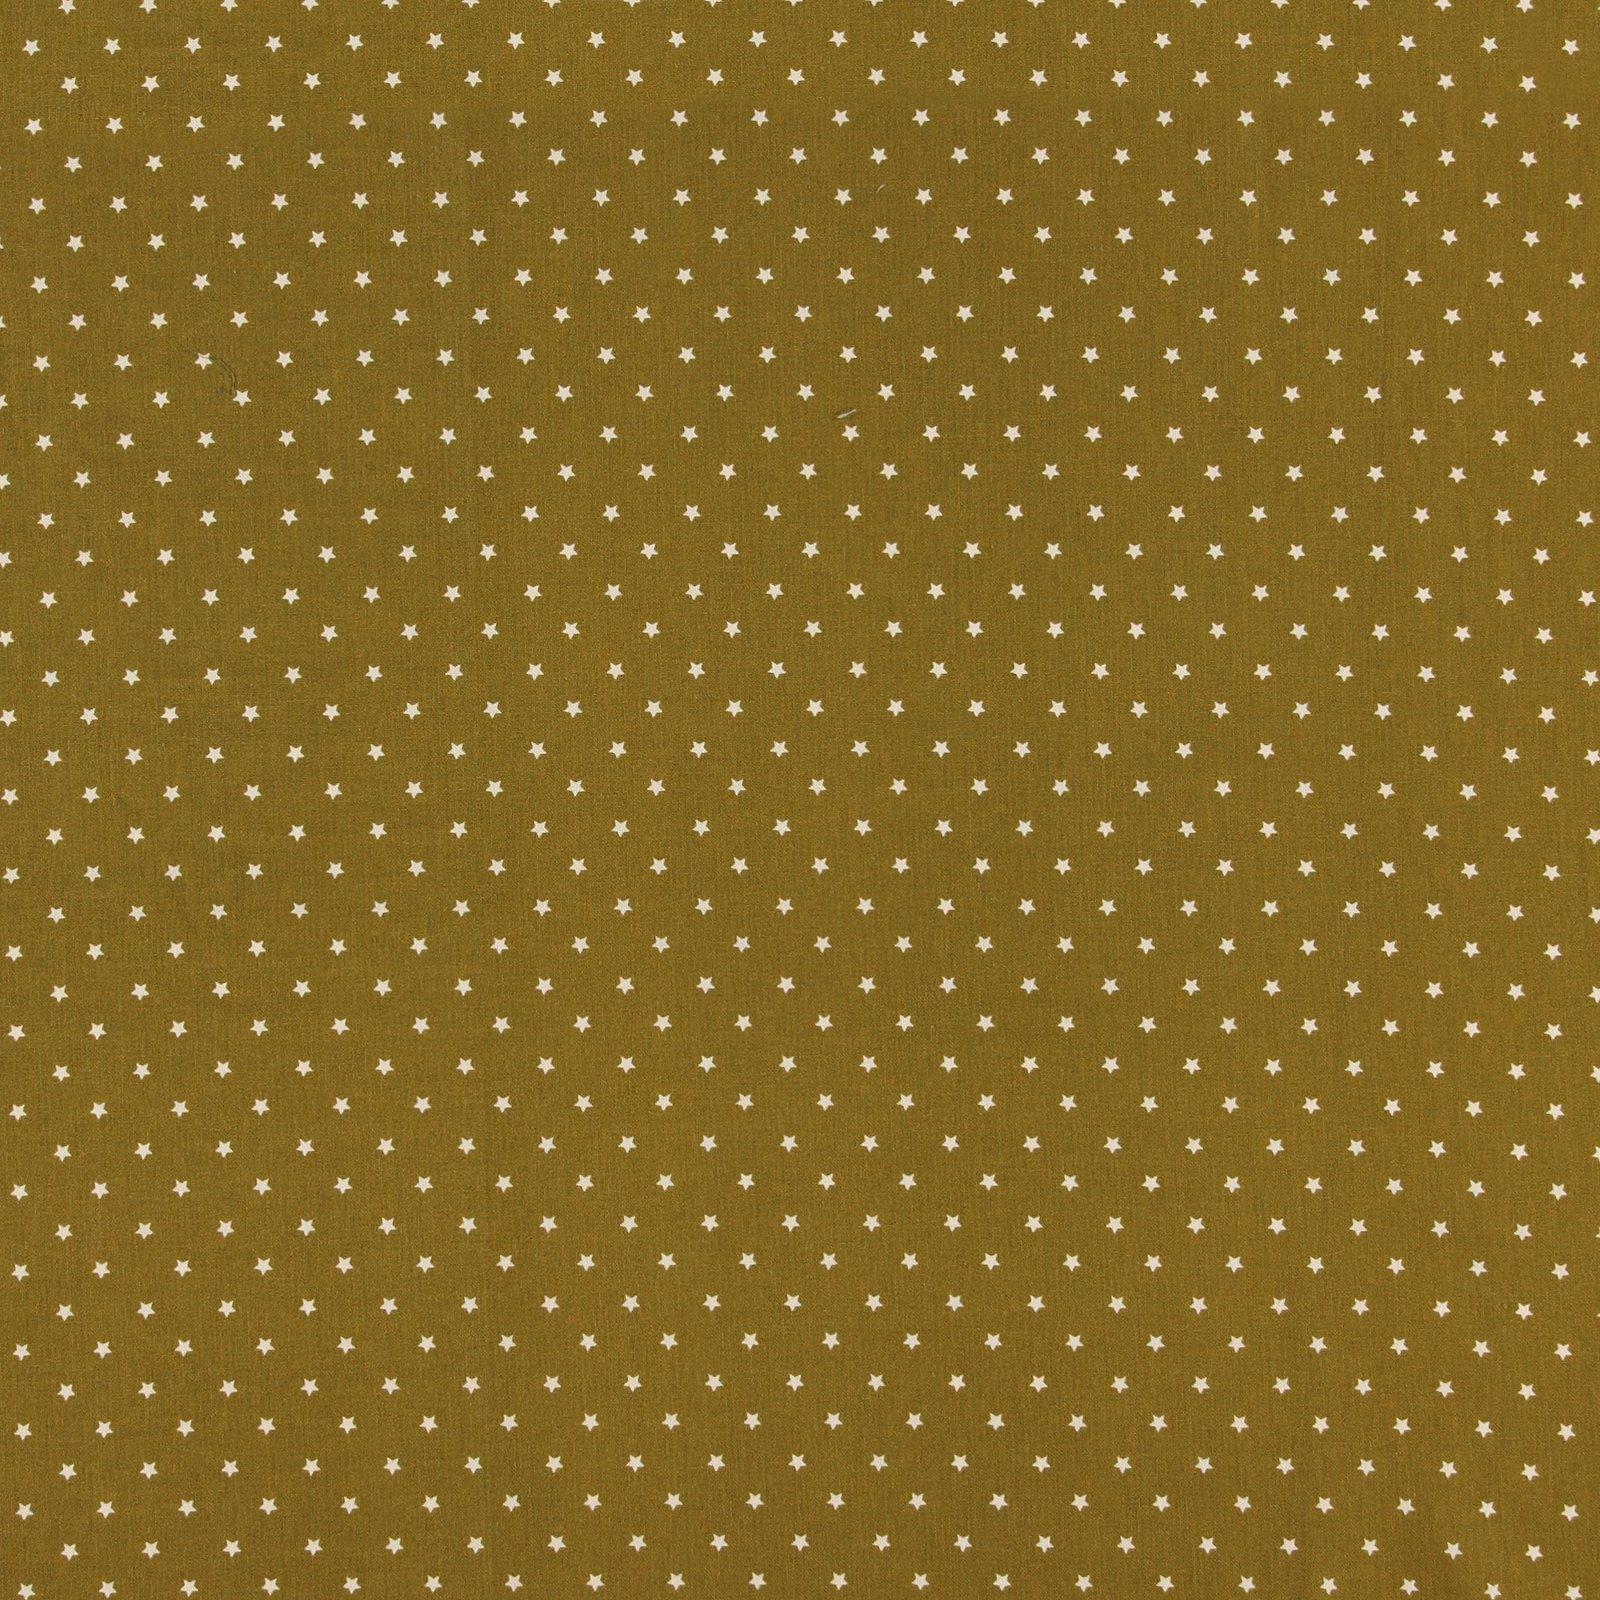 Half panama olive w stars 750258_pack_sp